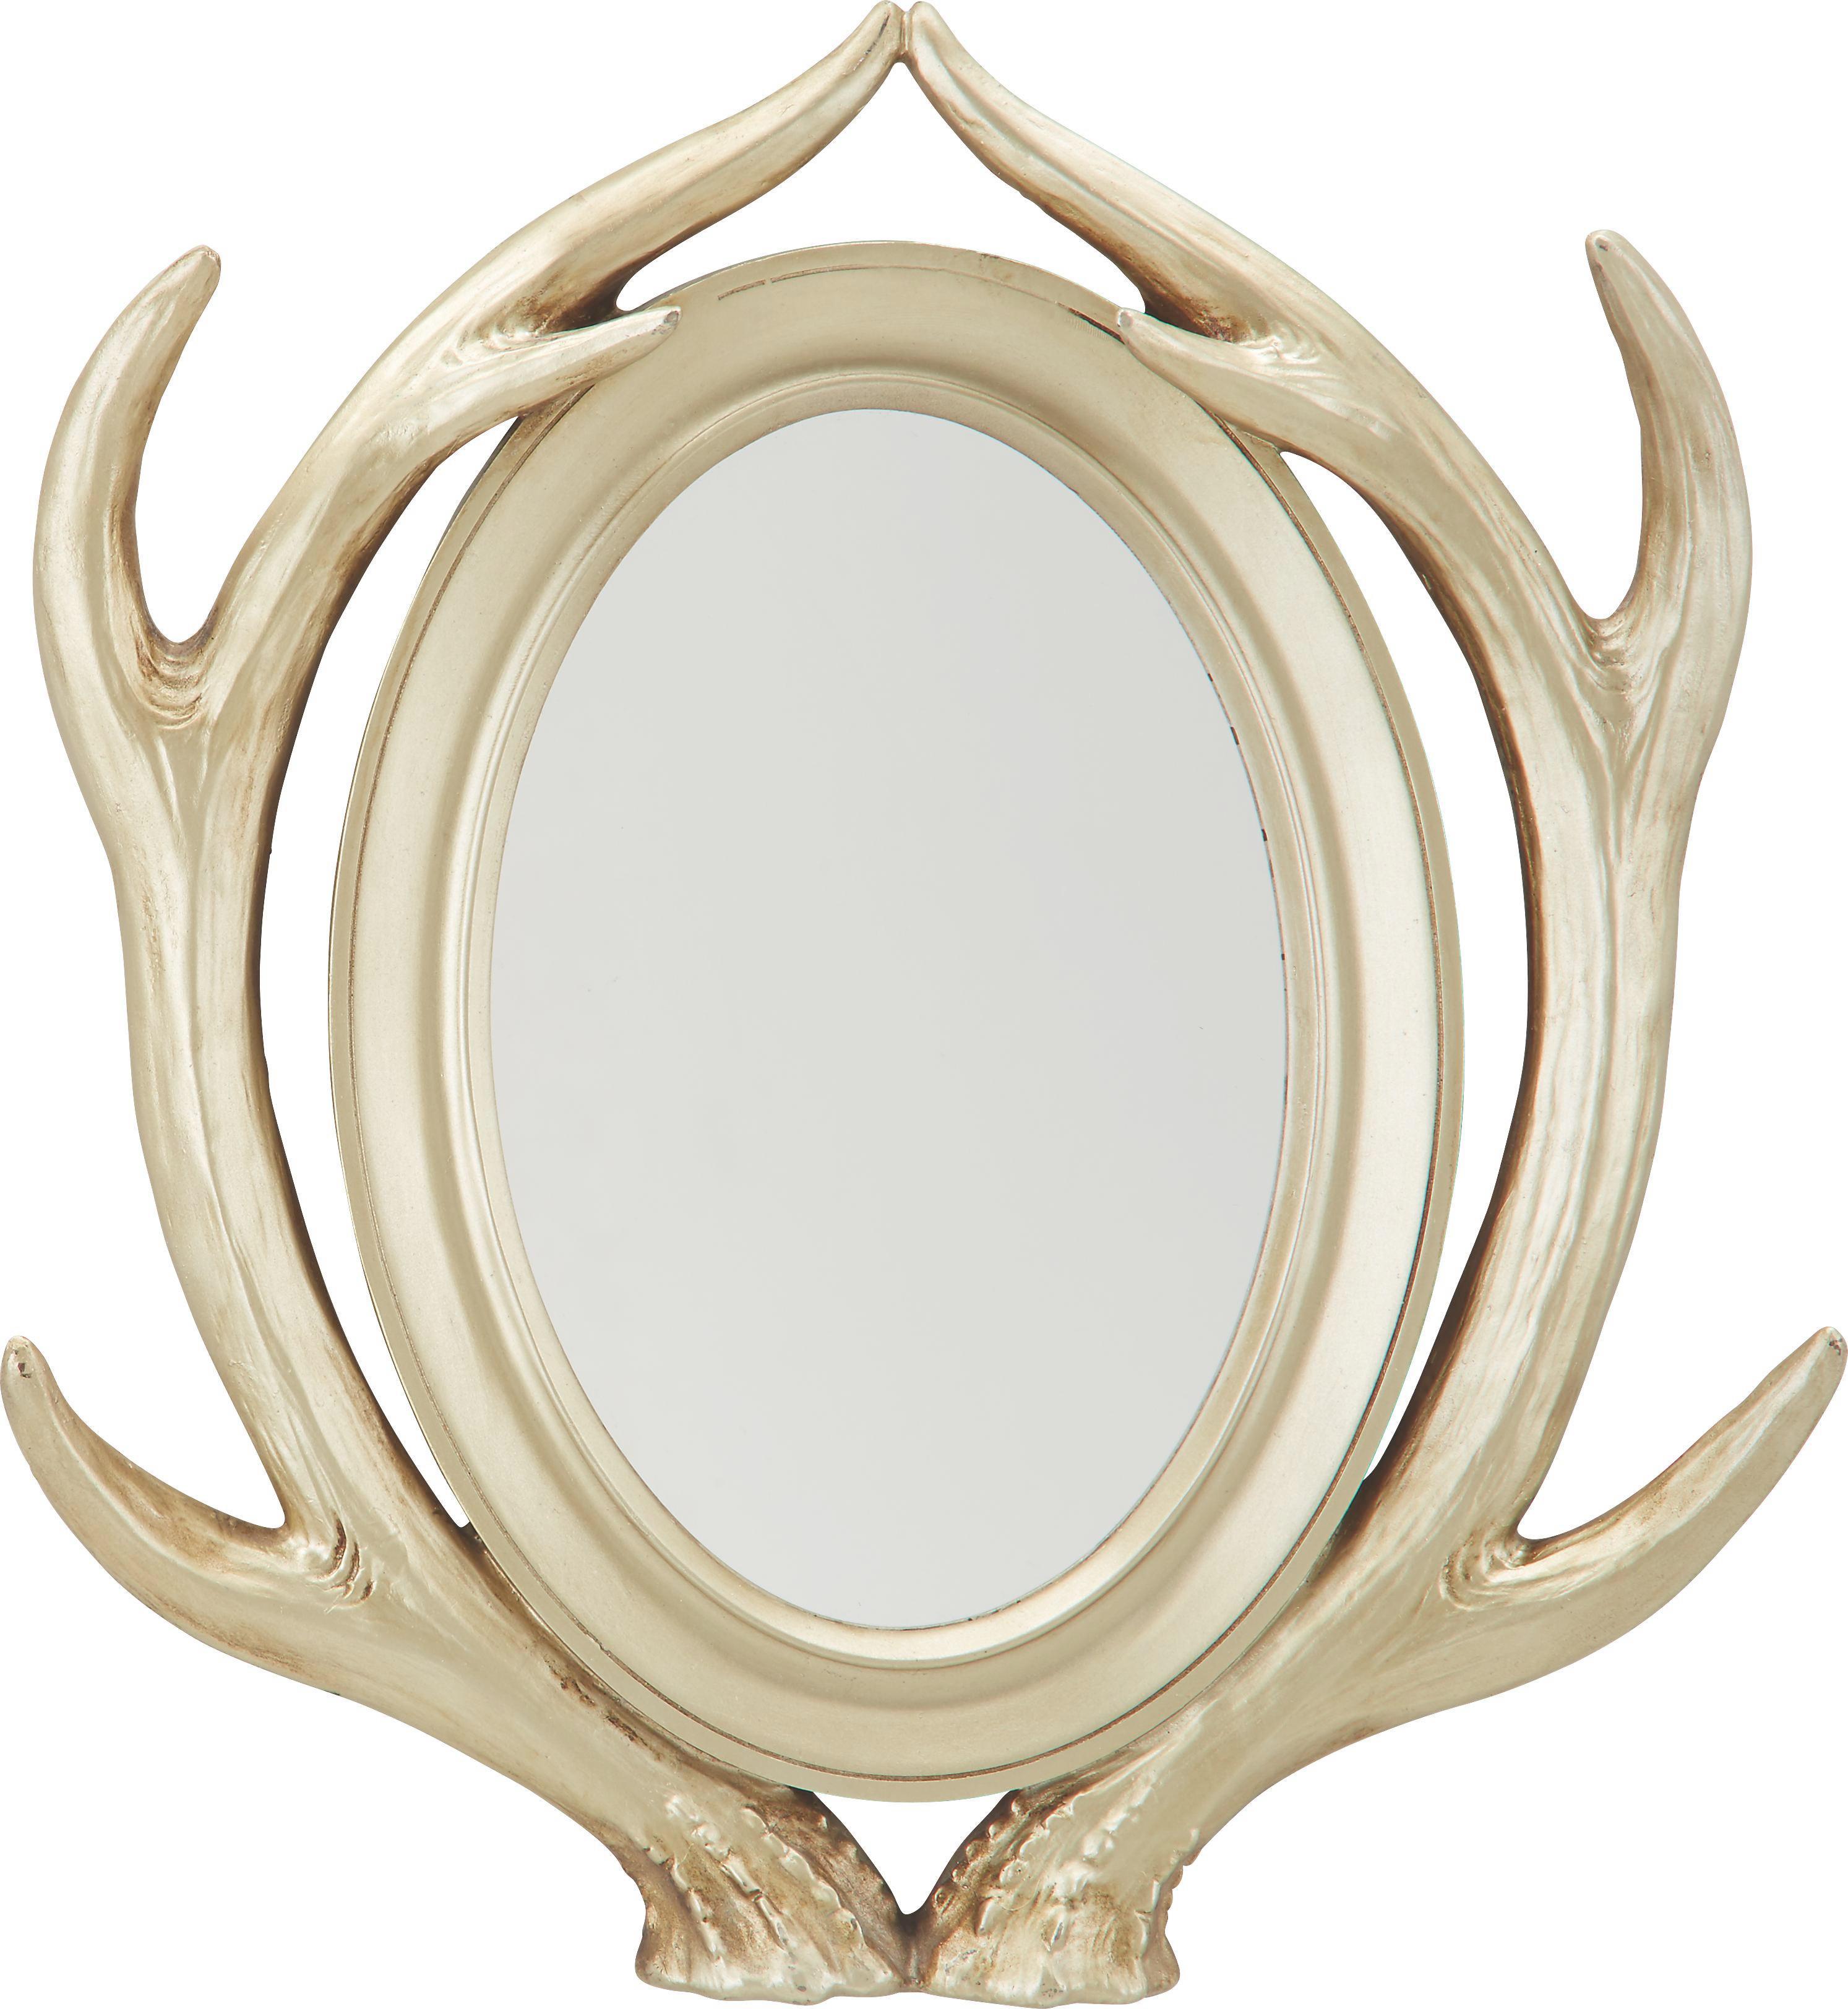 Wandspiegel ca. 38x45x8cm - Goldfarben, Glas/Kunststoff (38/45/8cm) - MÖMAX modern living